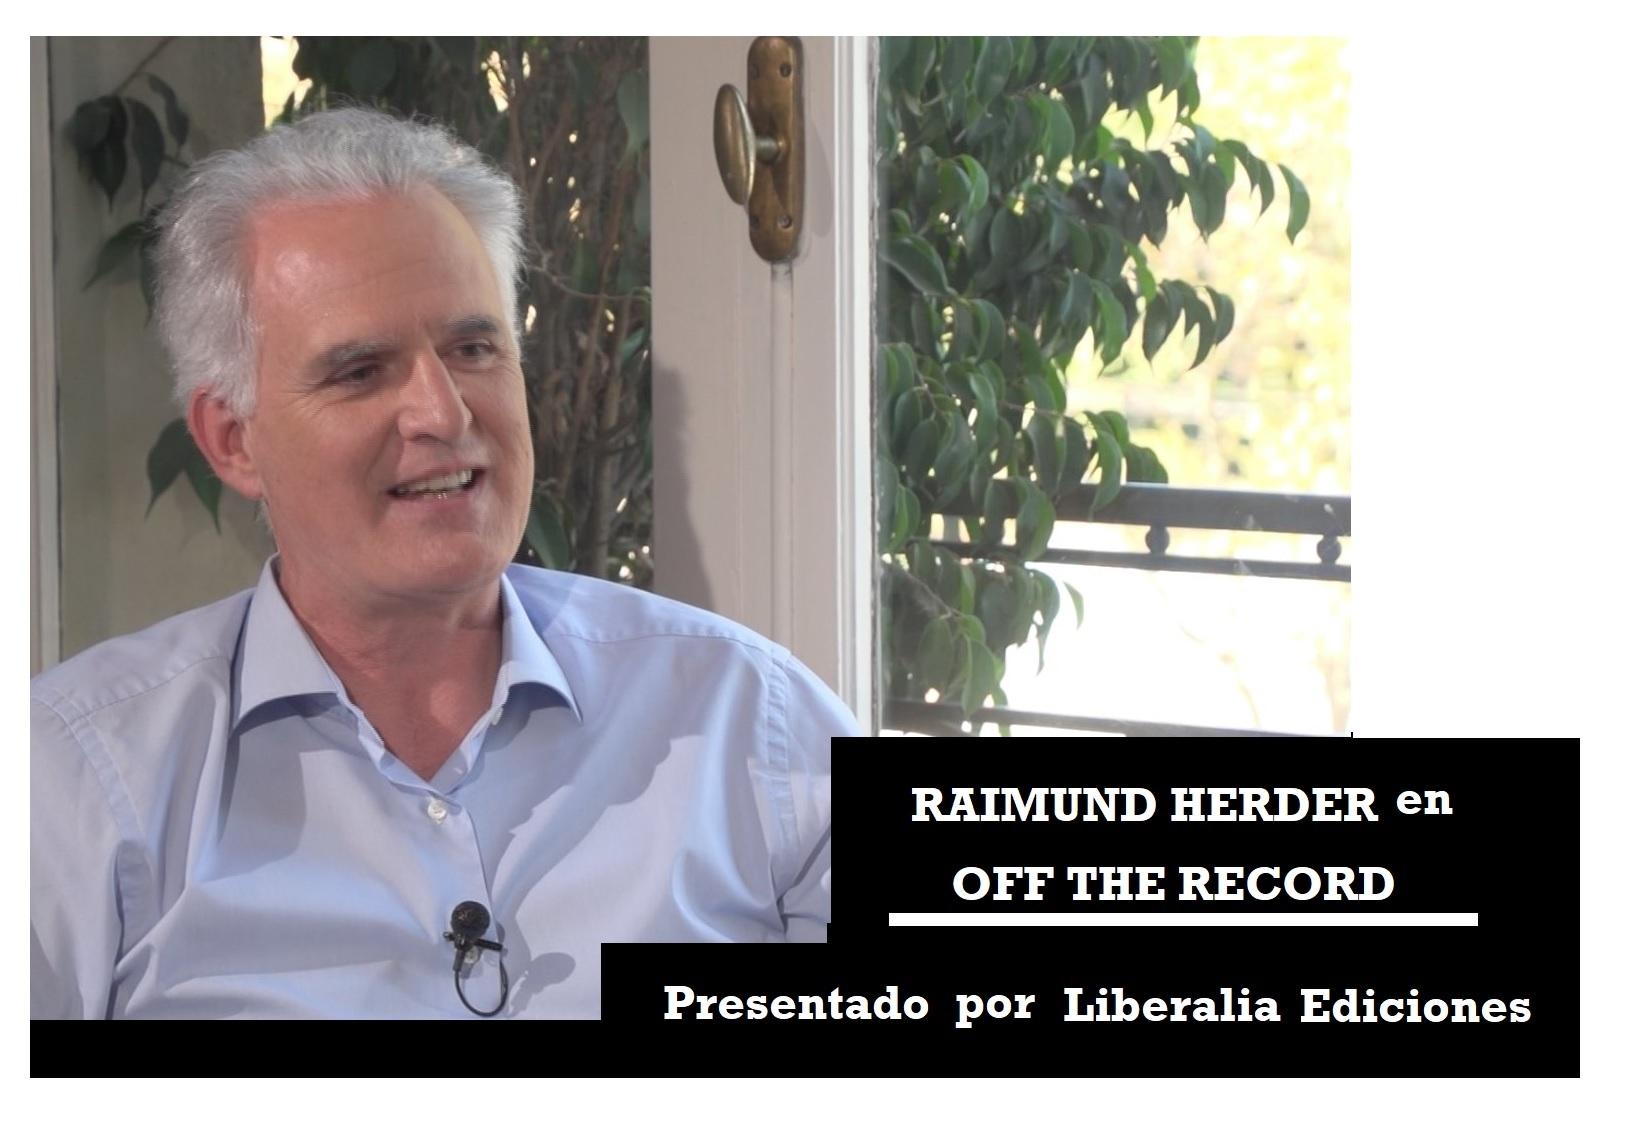 Raimund Herder en OFF THE RECORD 2019